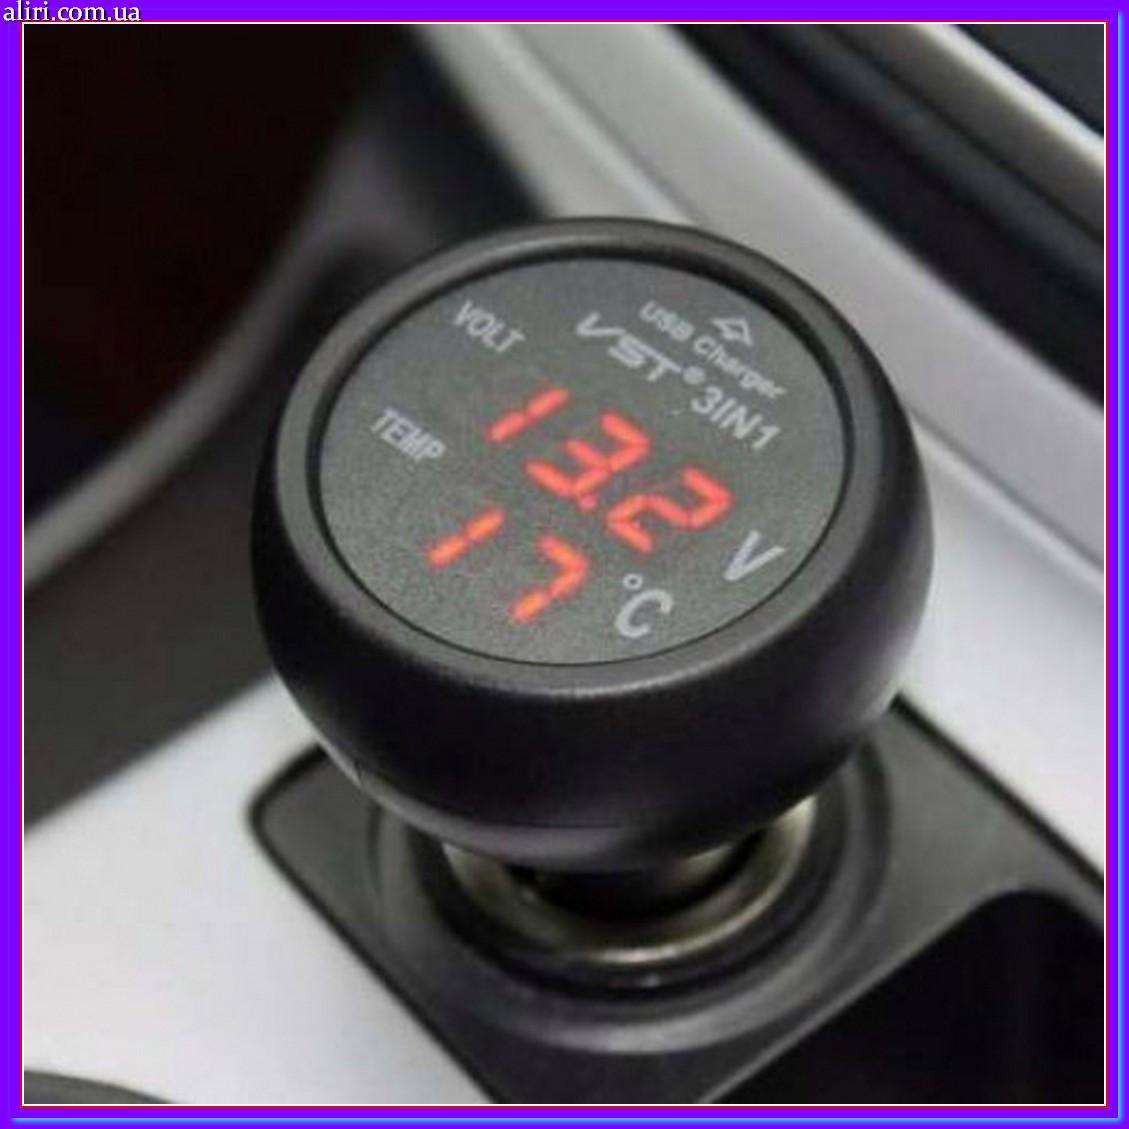 Автомобильный термометр вольтметр - USB VST 706-1